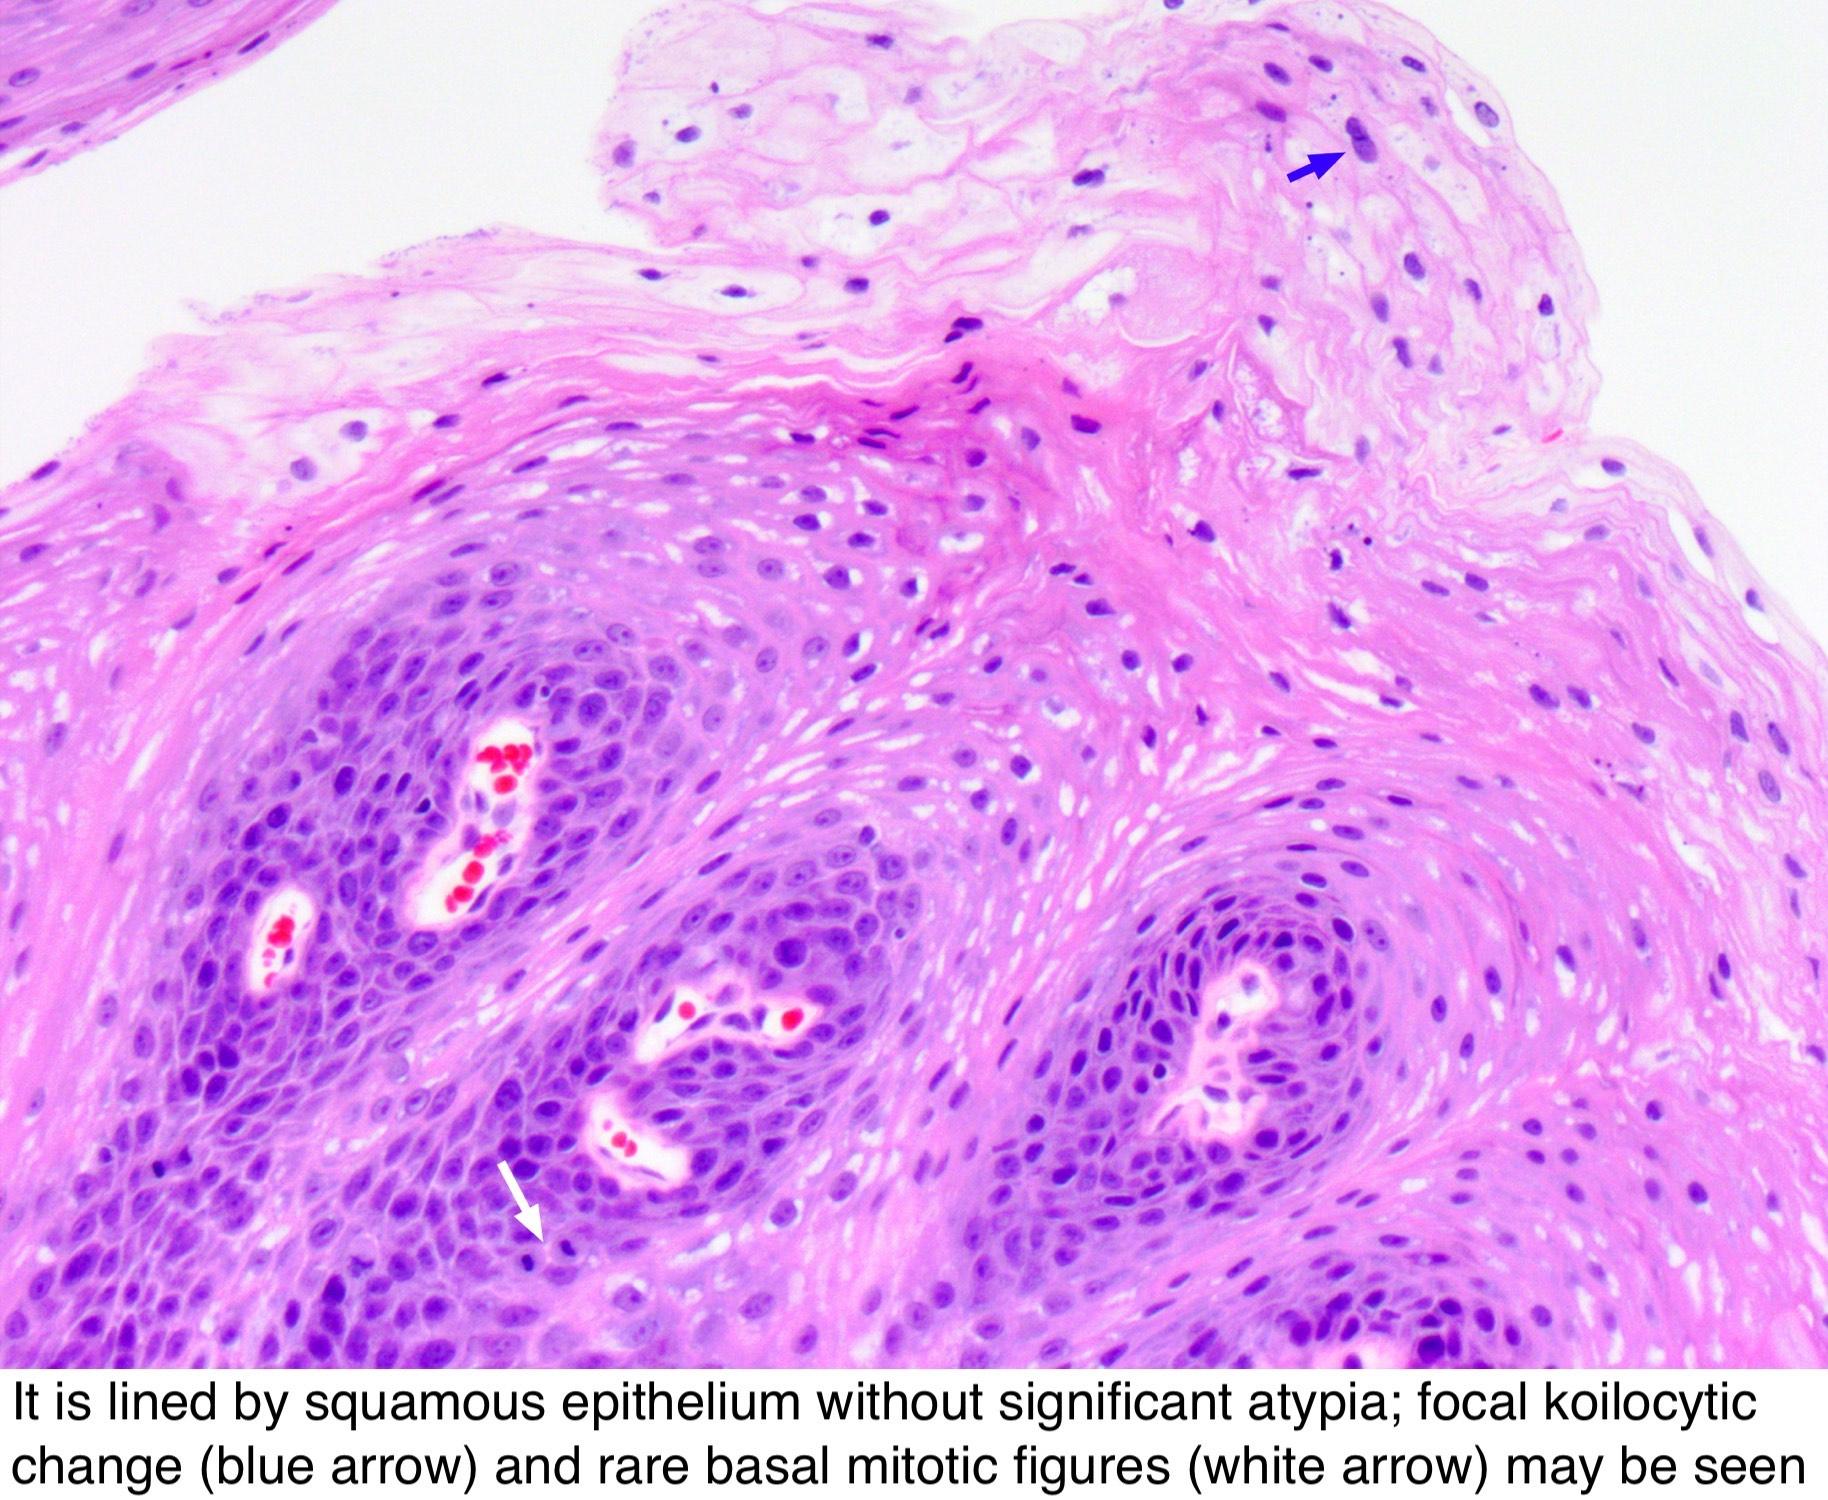 sinonasal papilloma pathology outlines